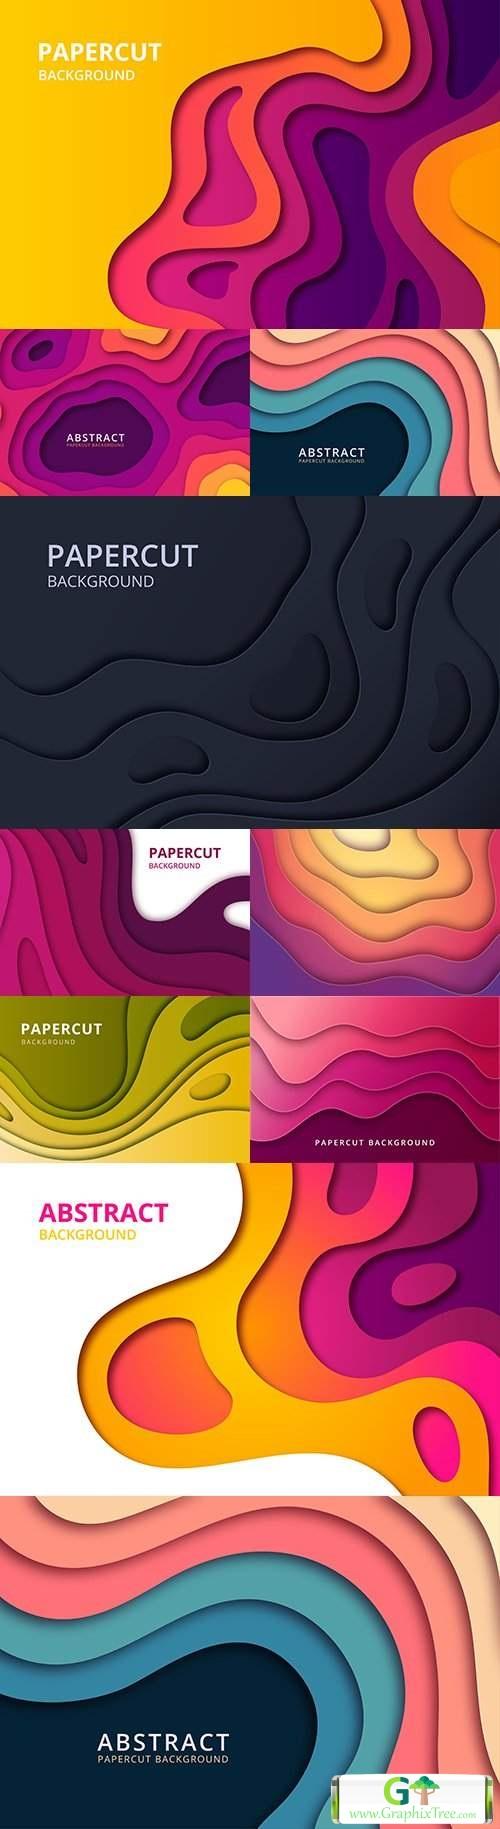 Abstract papercut geometric decoration shape background